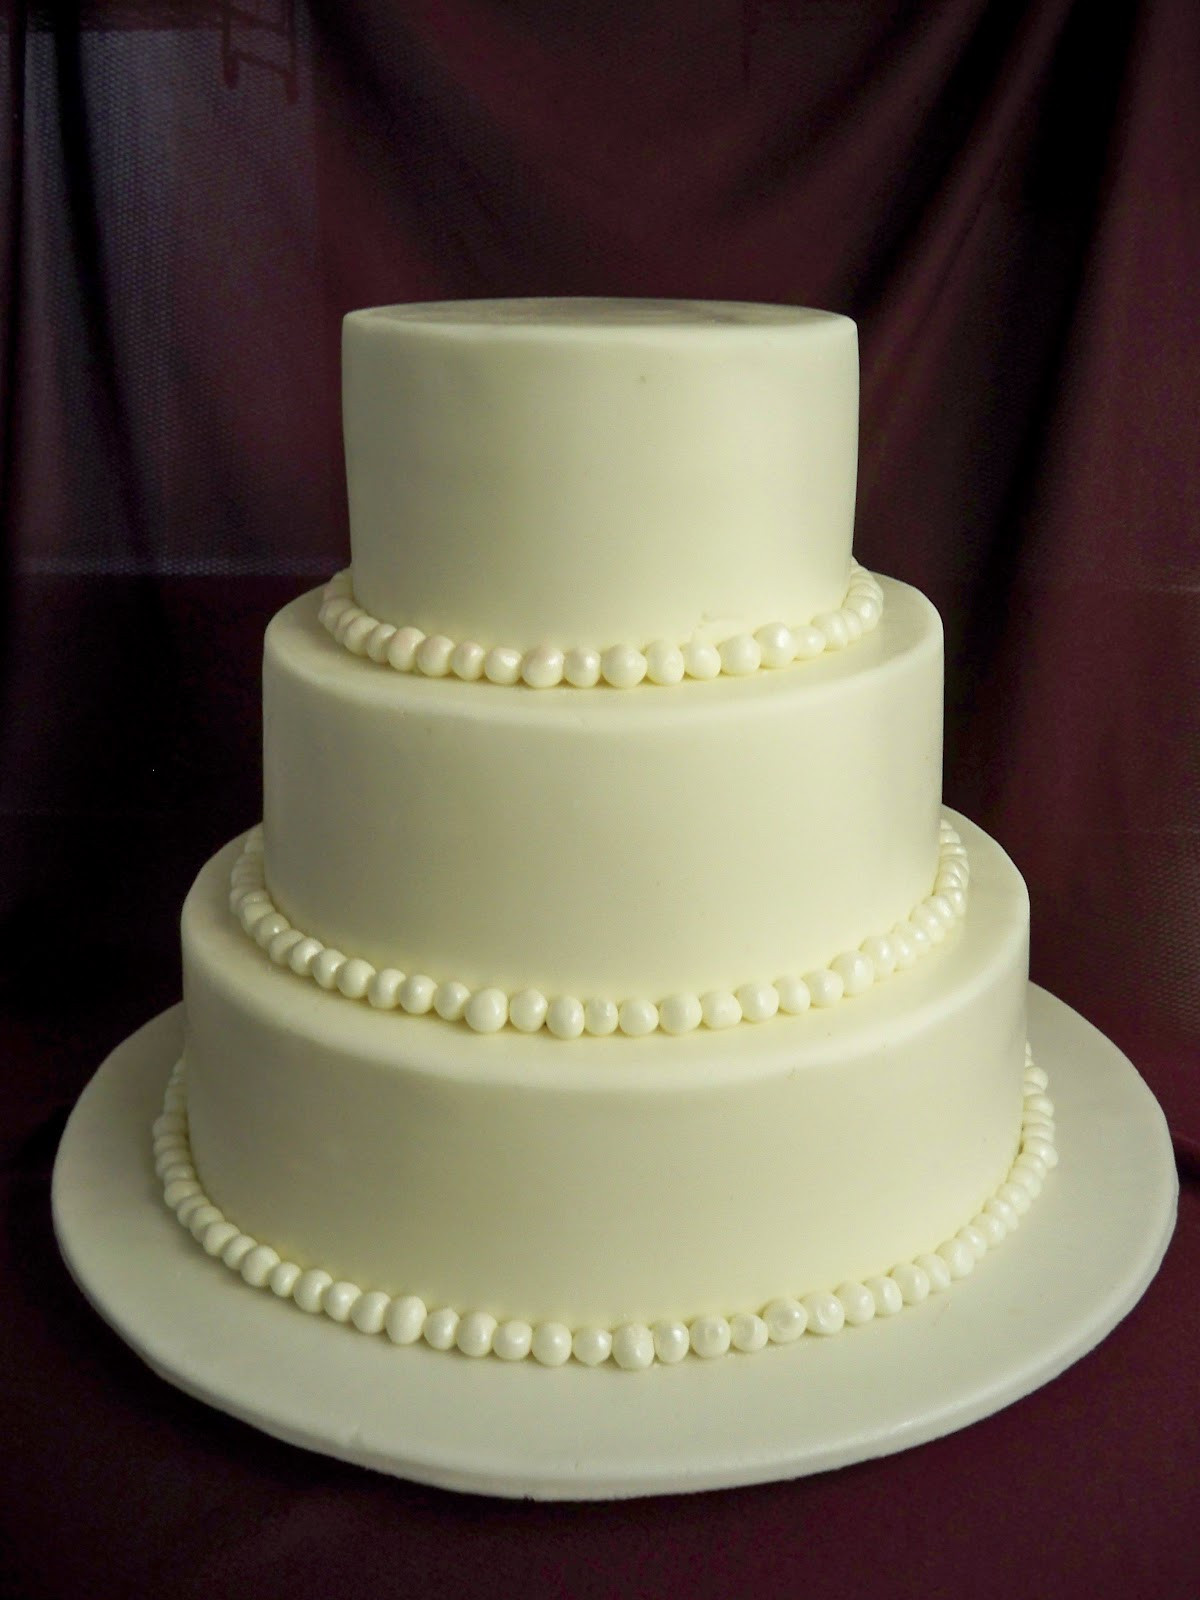 Wedding Cakes 3 Tier  Price for 3 tier wedding cake idea in 2017